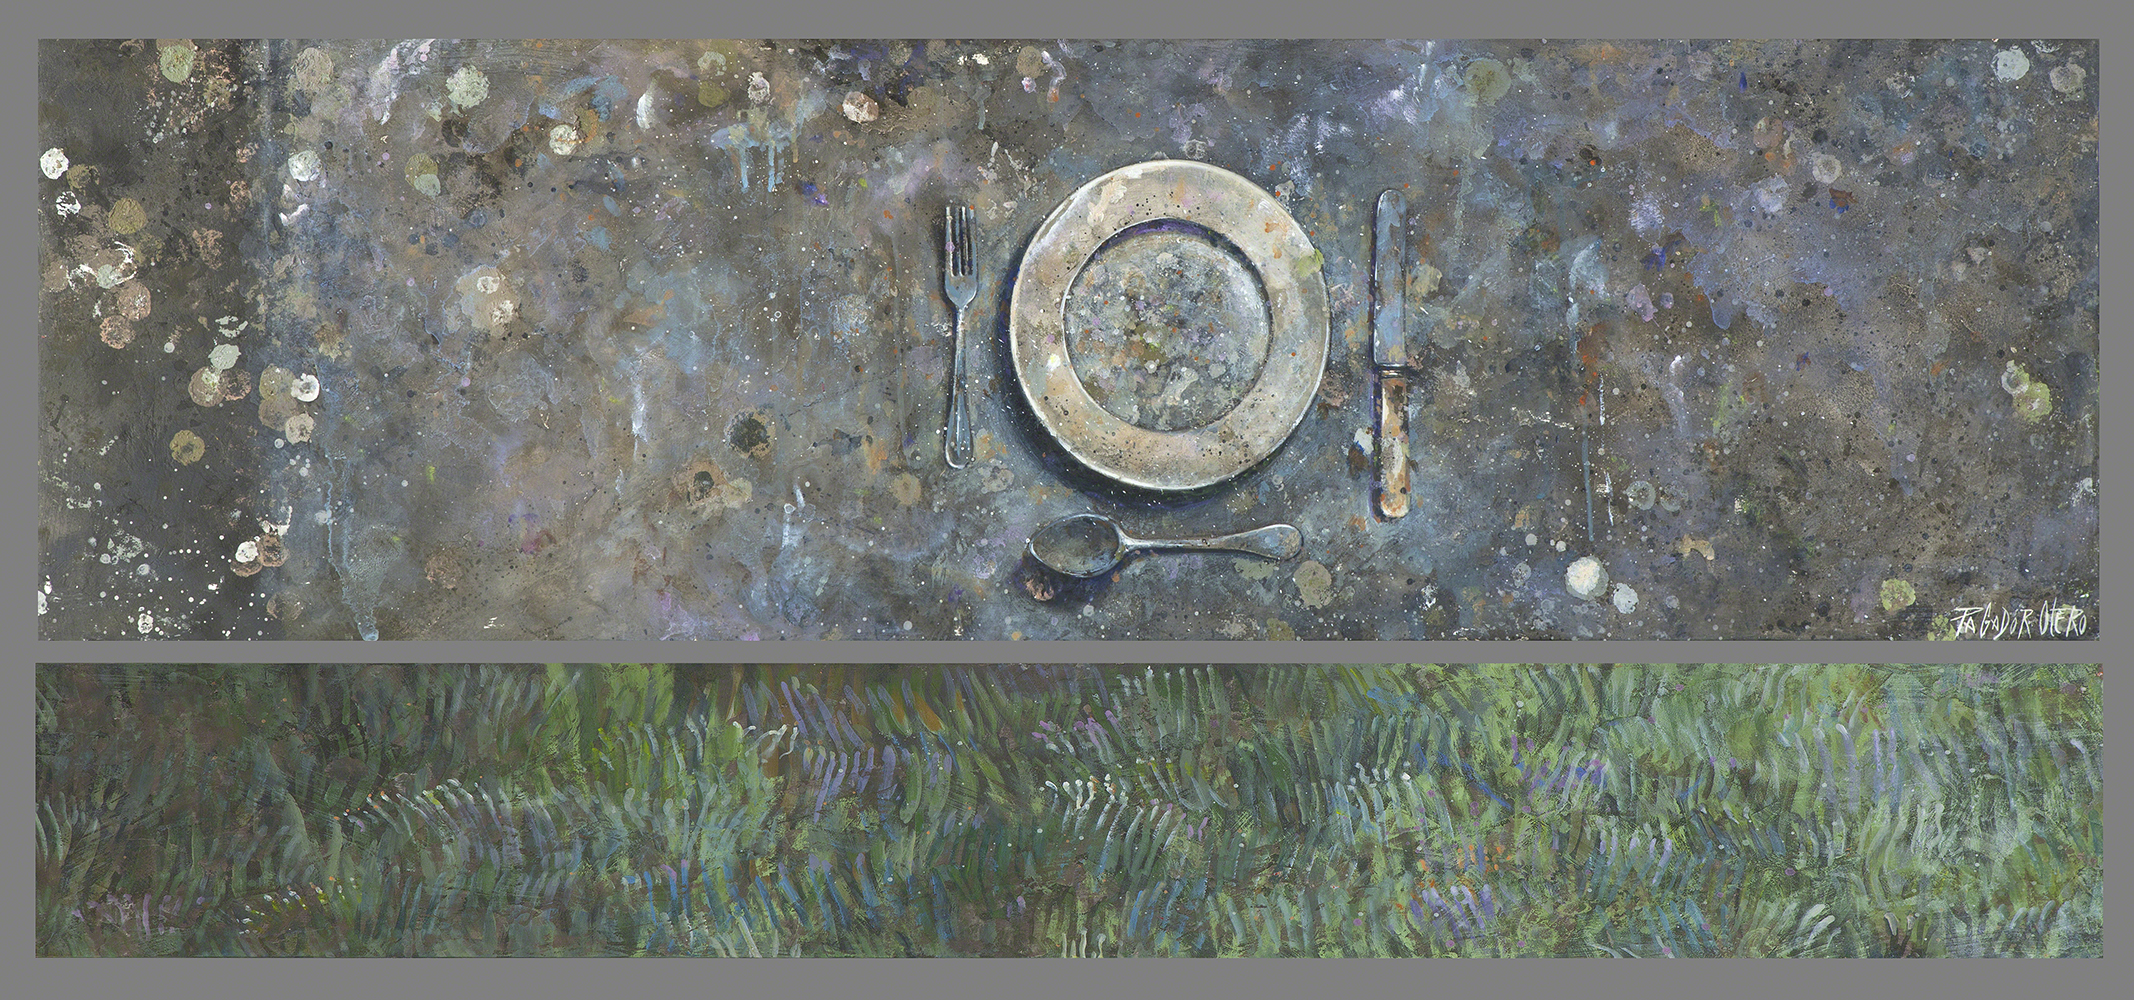 SIN TITULO - Mx/Tb - 71´5x155´5 cm -Jávea - 1998.